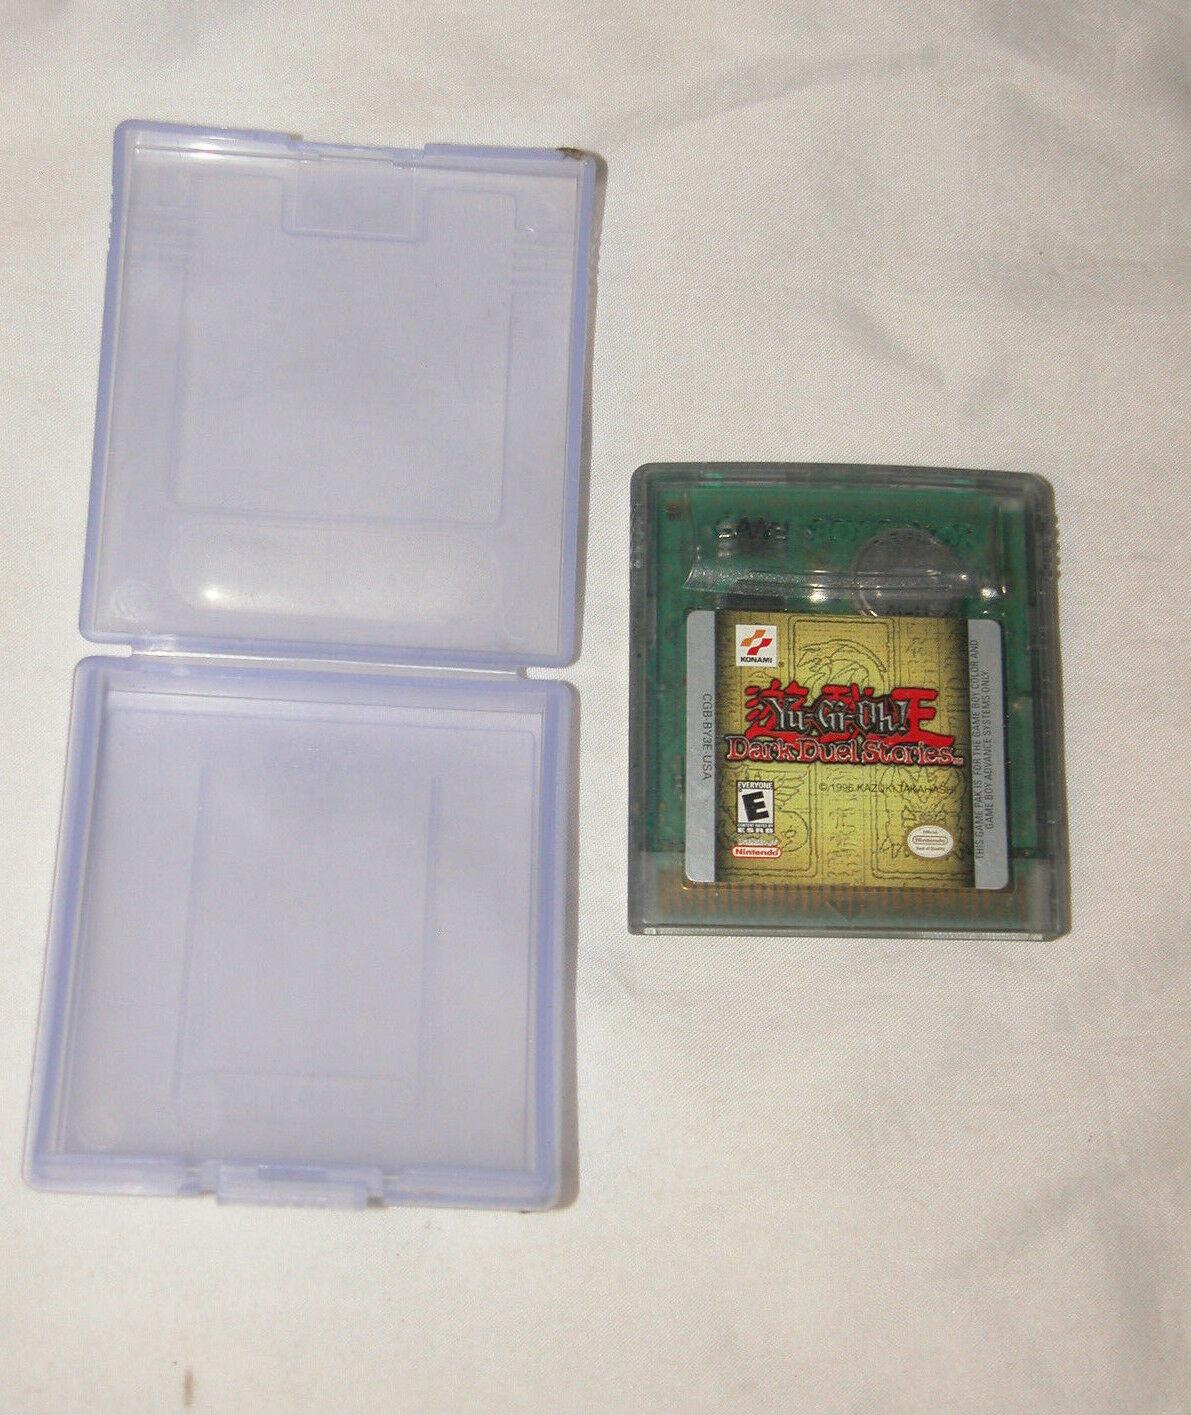 Yu-Gi-Oh Dark Duel Stories Nintendo Game Boy Color + Avancé Systèmes, 2002 image 3